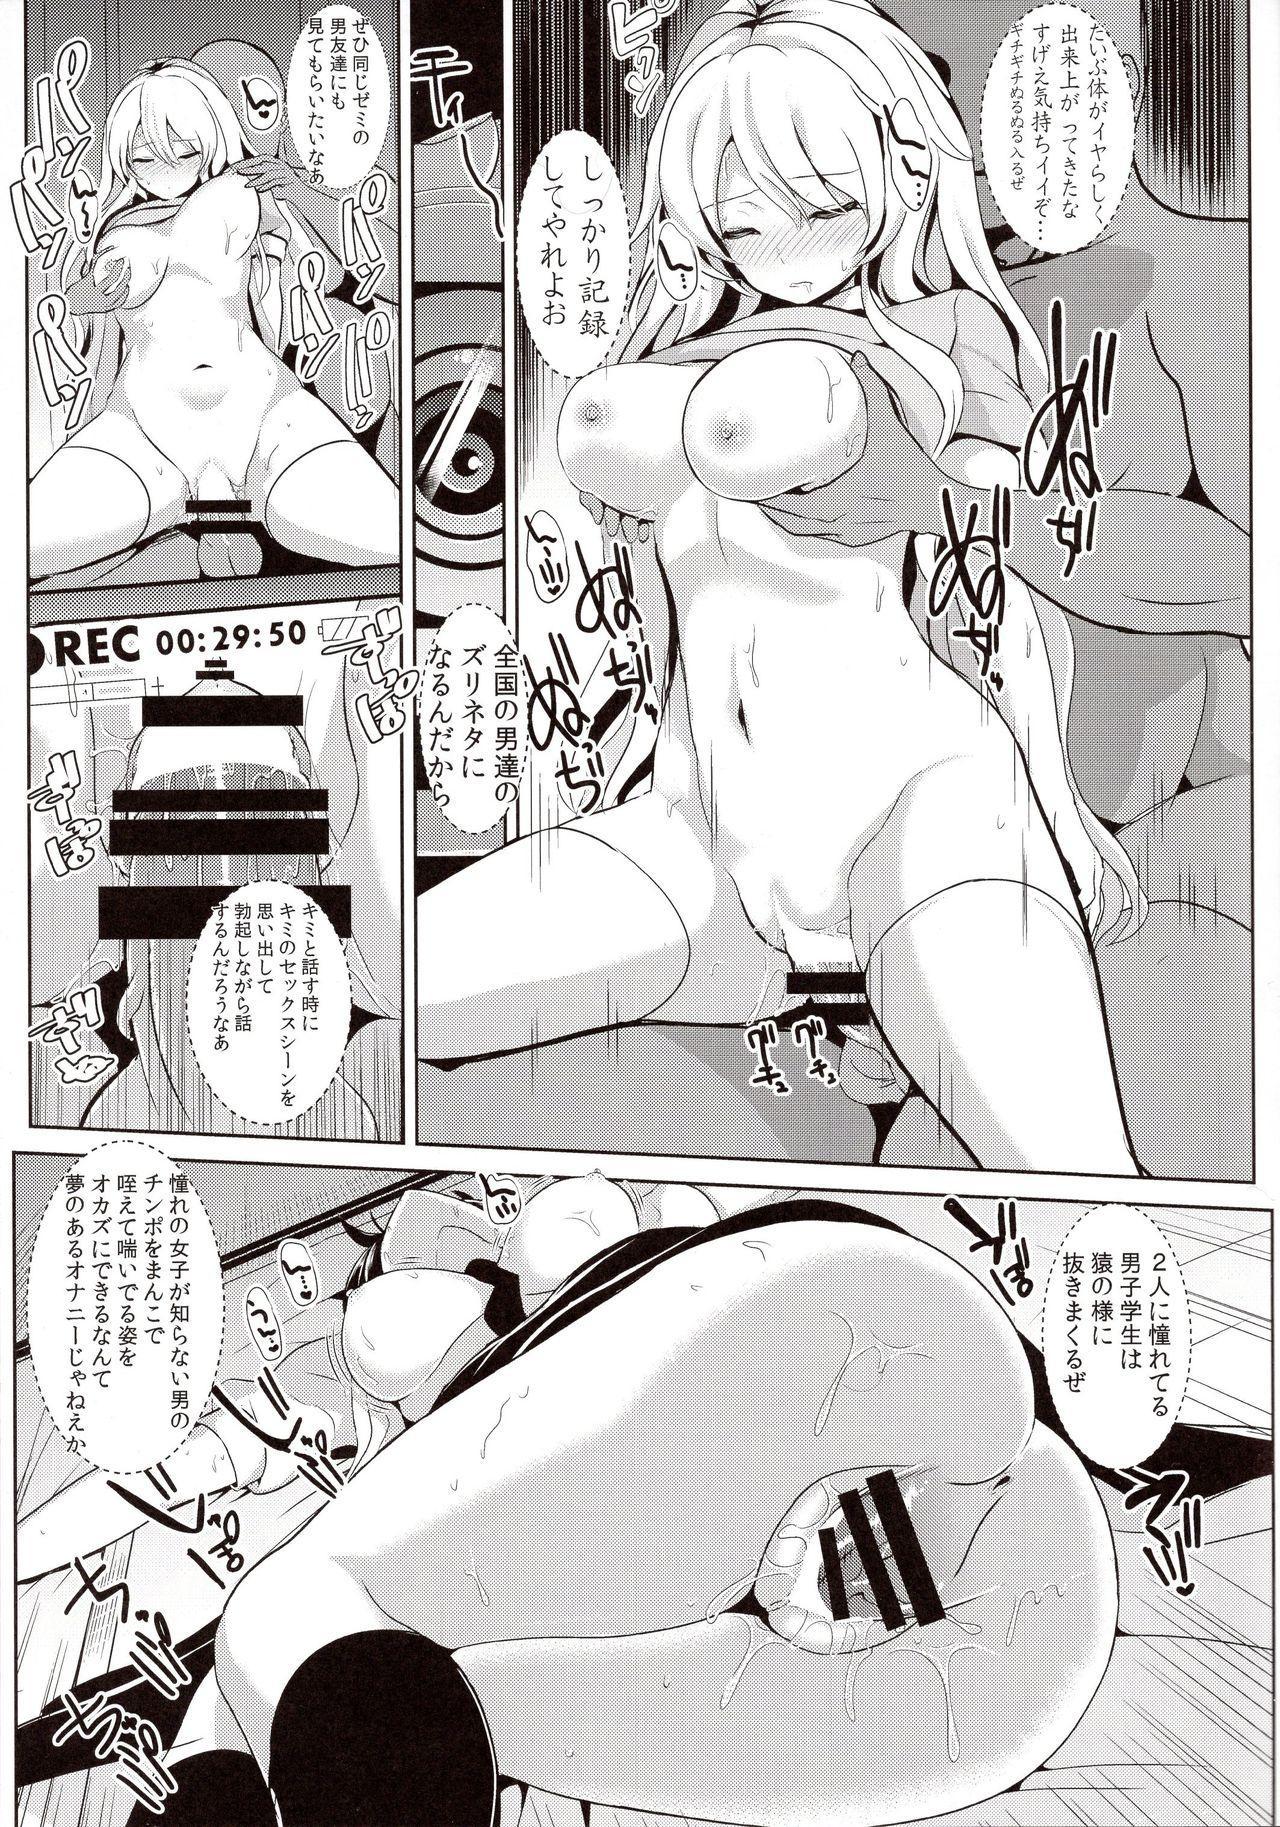 Touhou Suikan 2 Hifuu Club 13